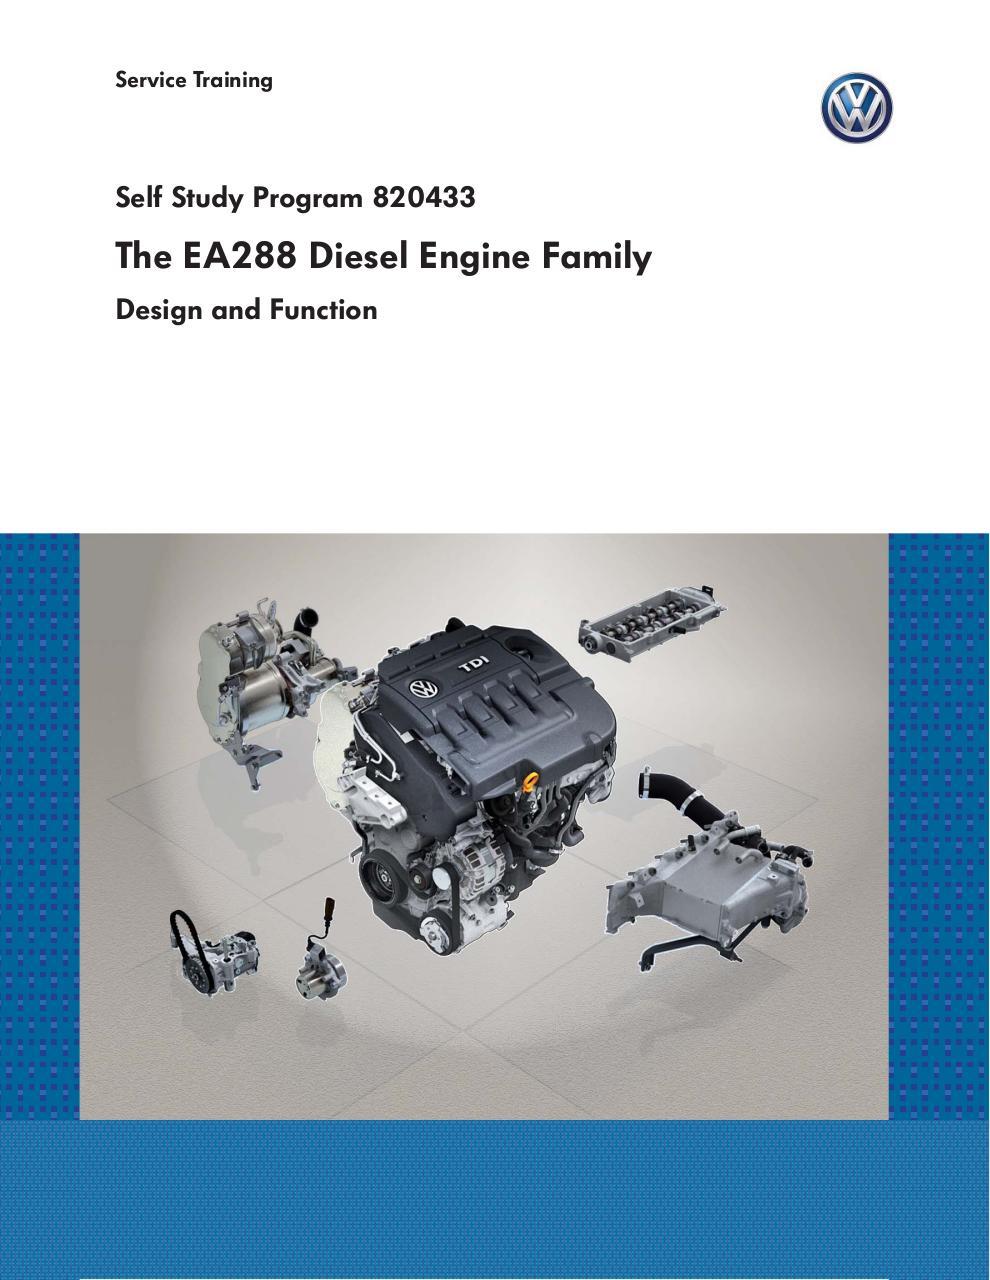 Ssp 840233 Ea288 Diesel Engine Family Par Wisniem Fichier Pdf